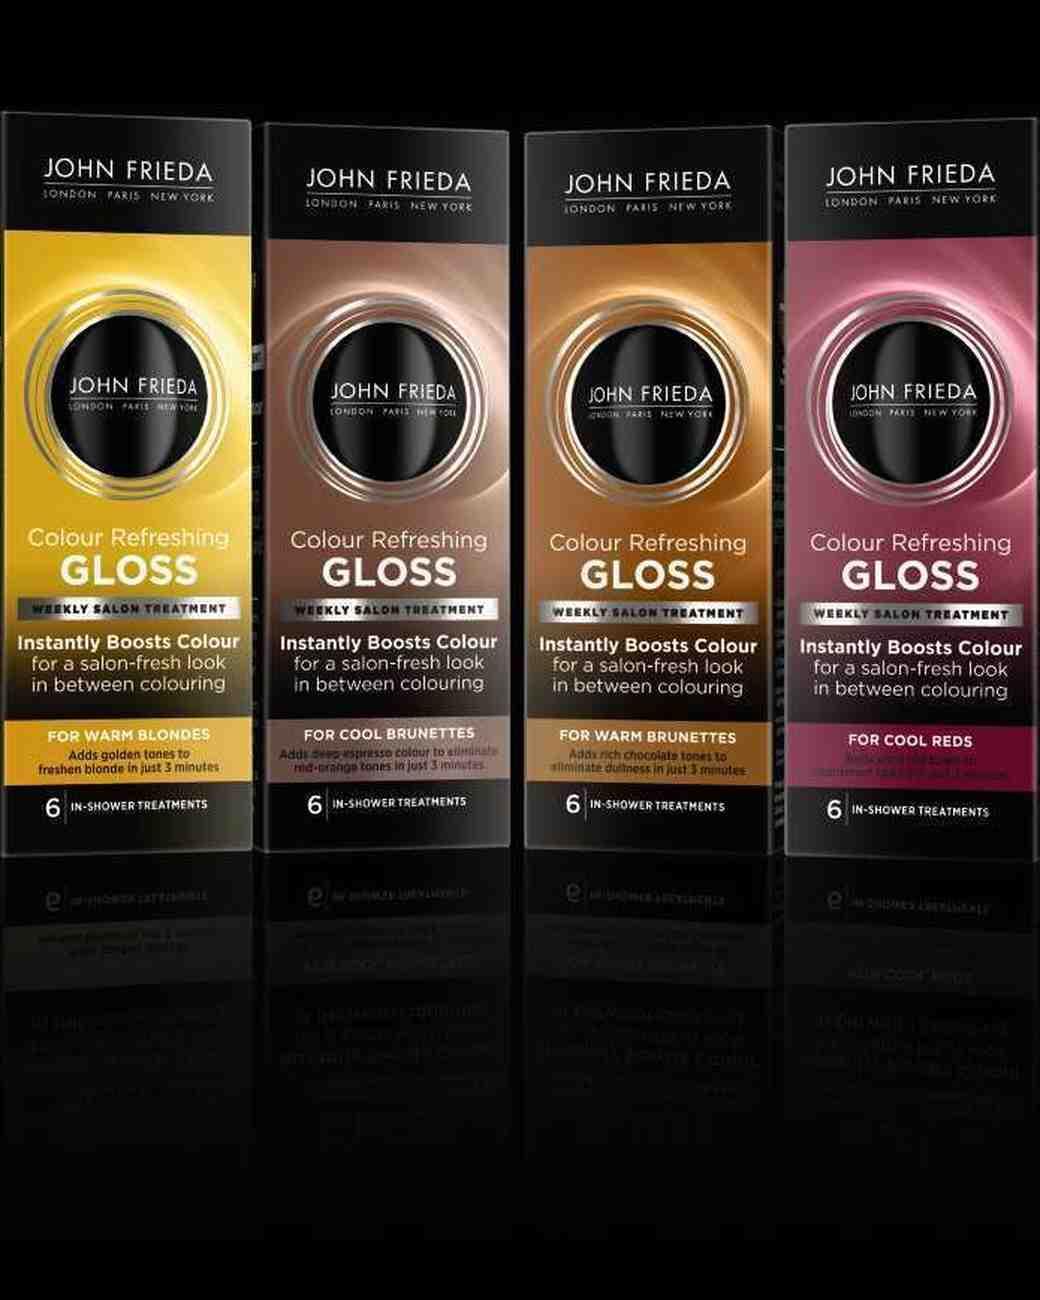 John Frieda Color Refreshing Gloss